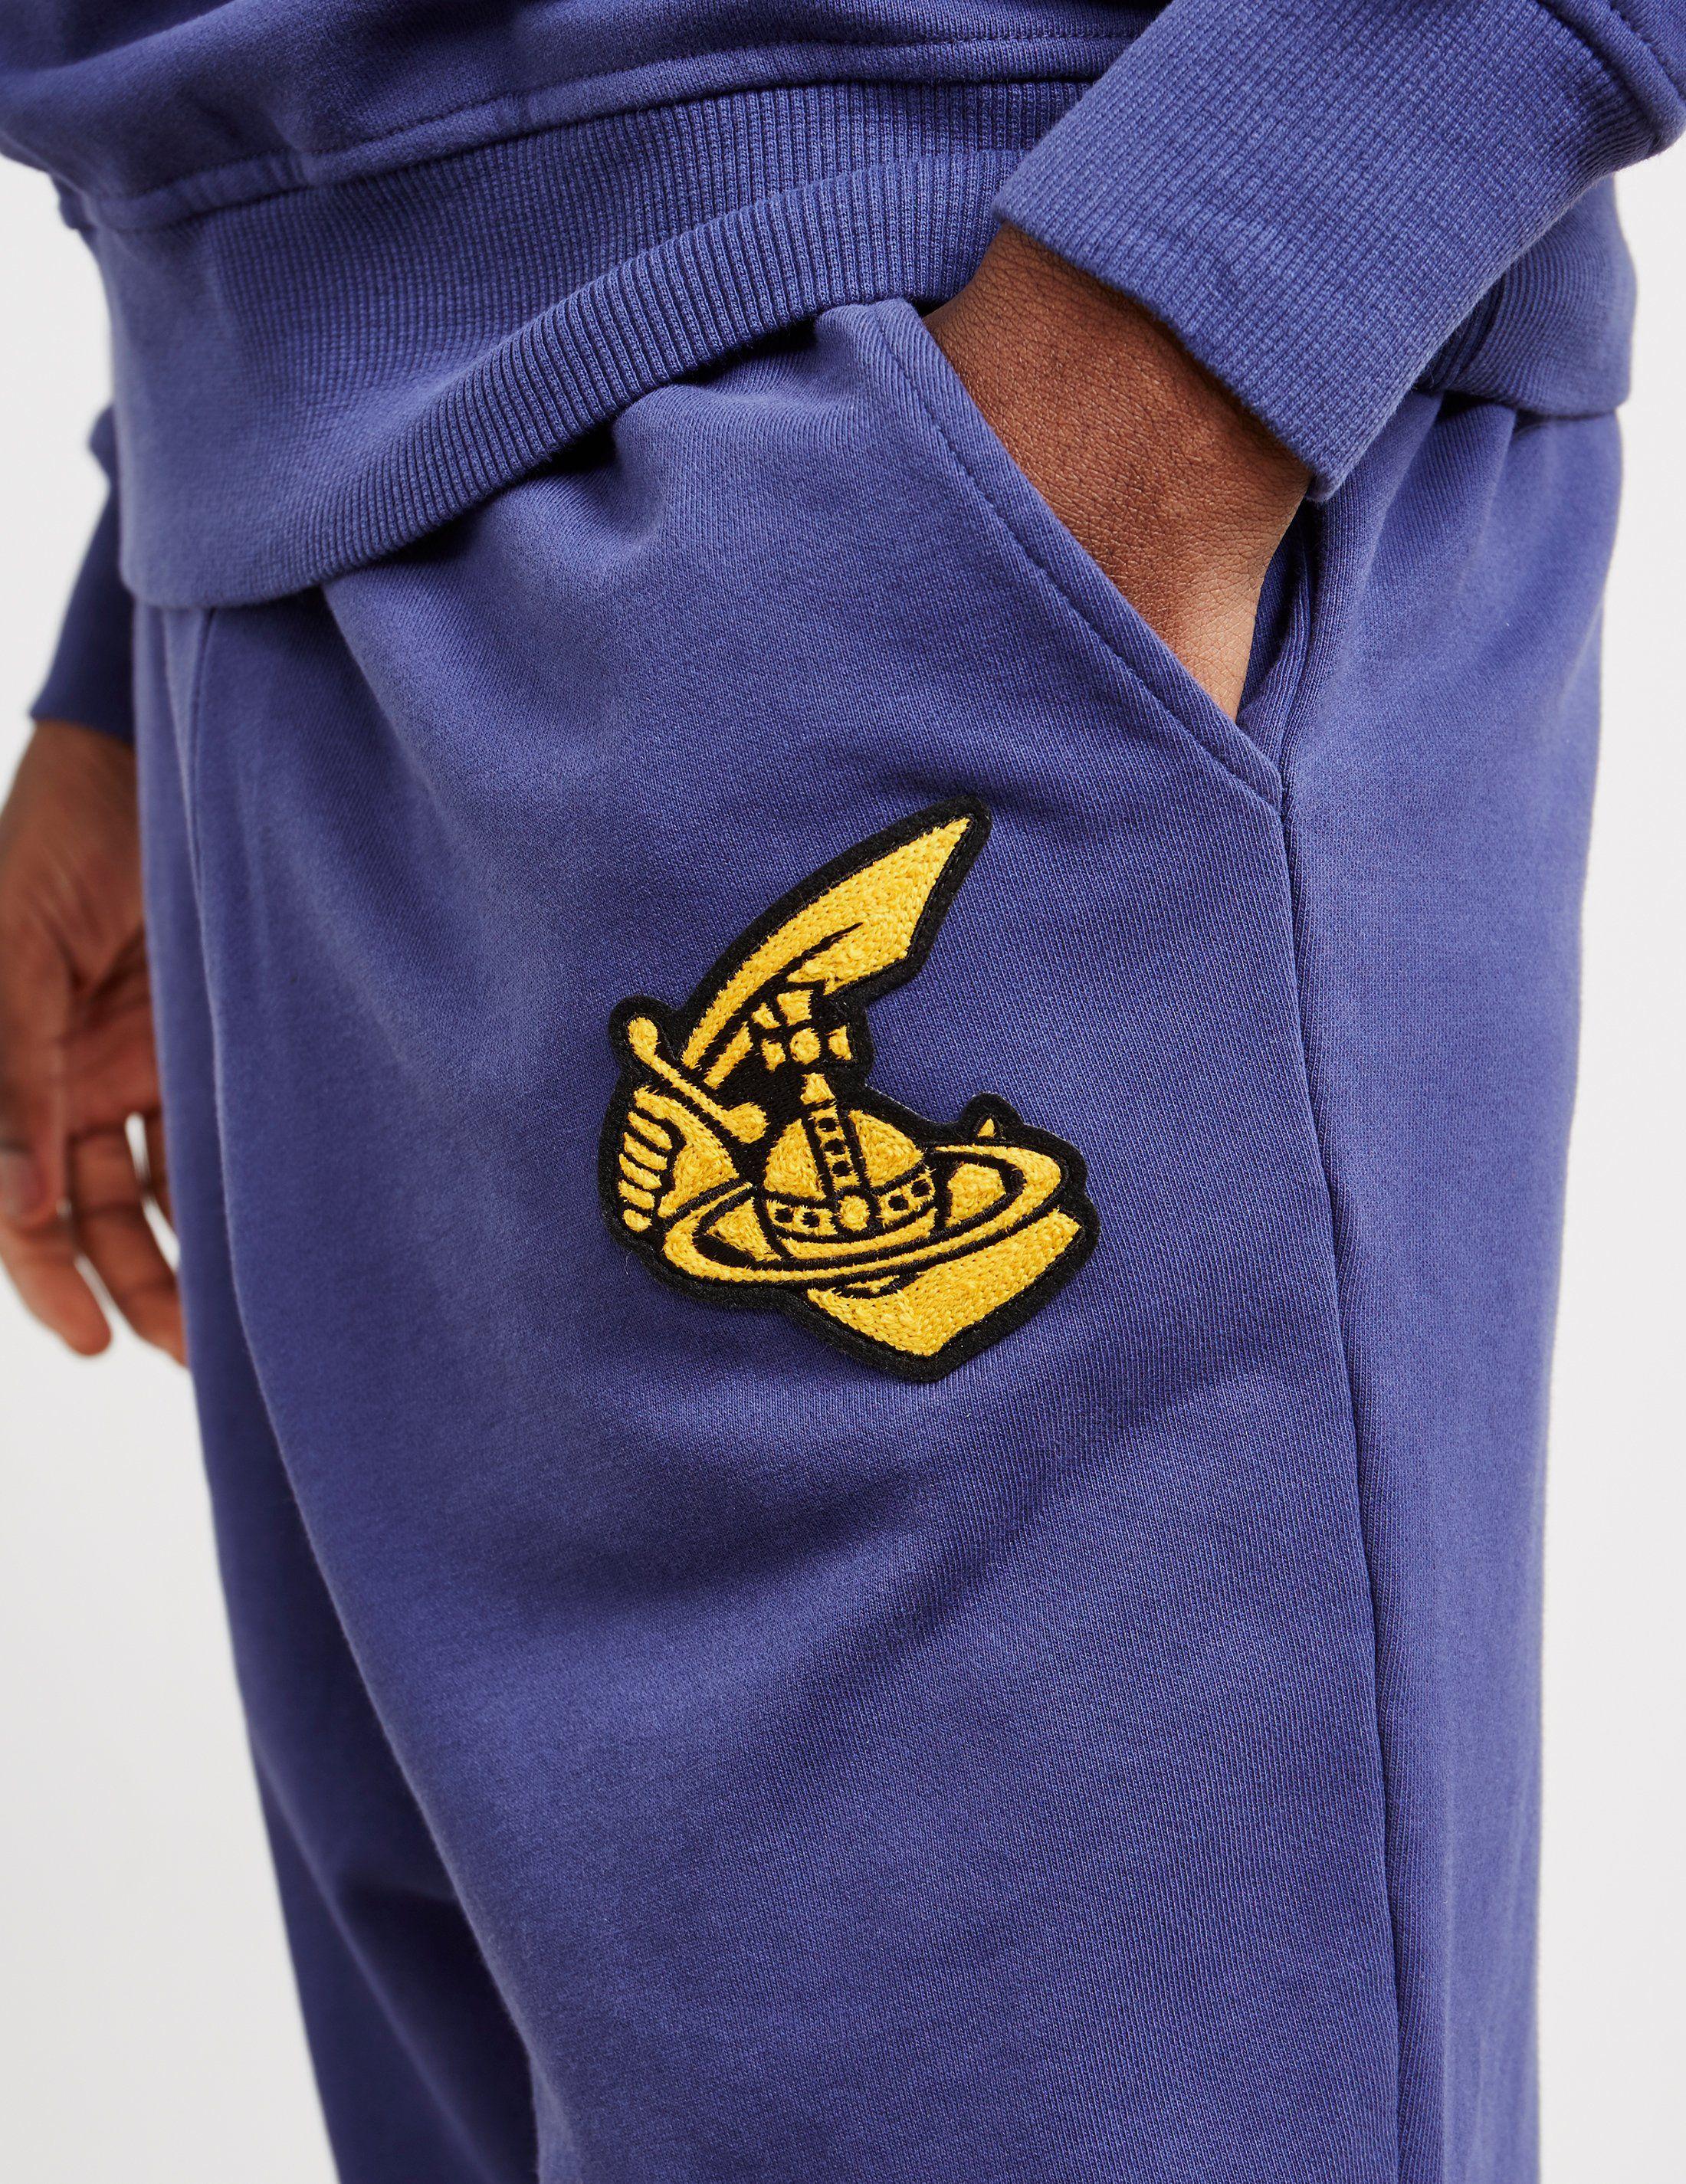 Vivienne Westwood Anglomania Sword Track Pants